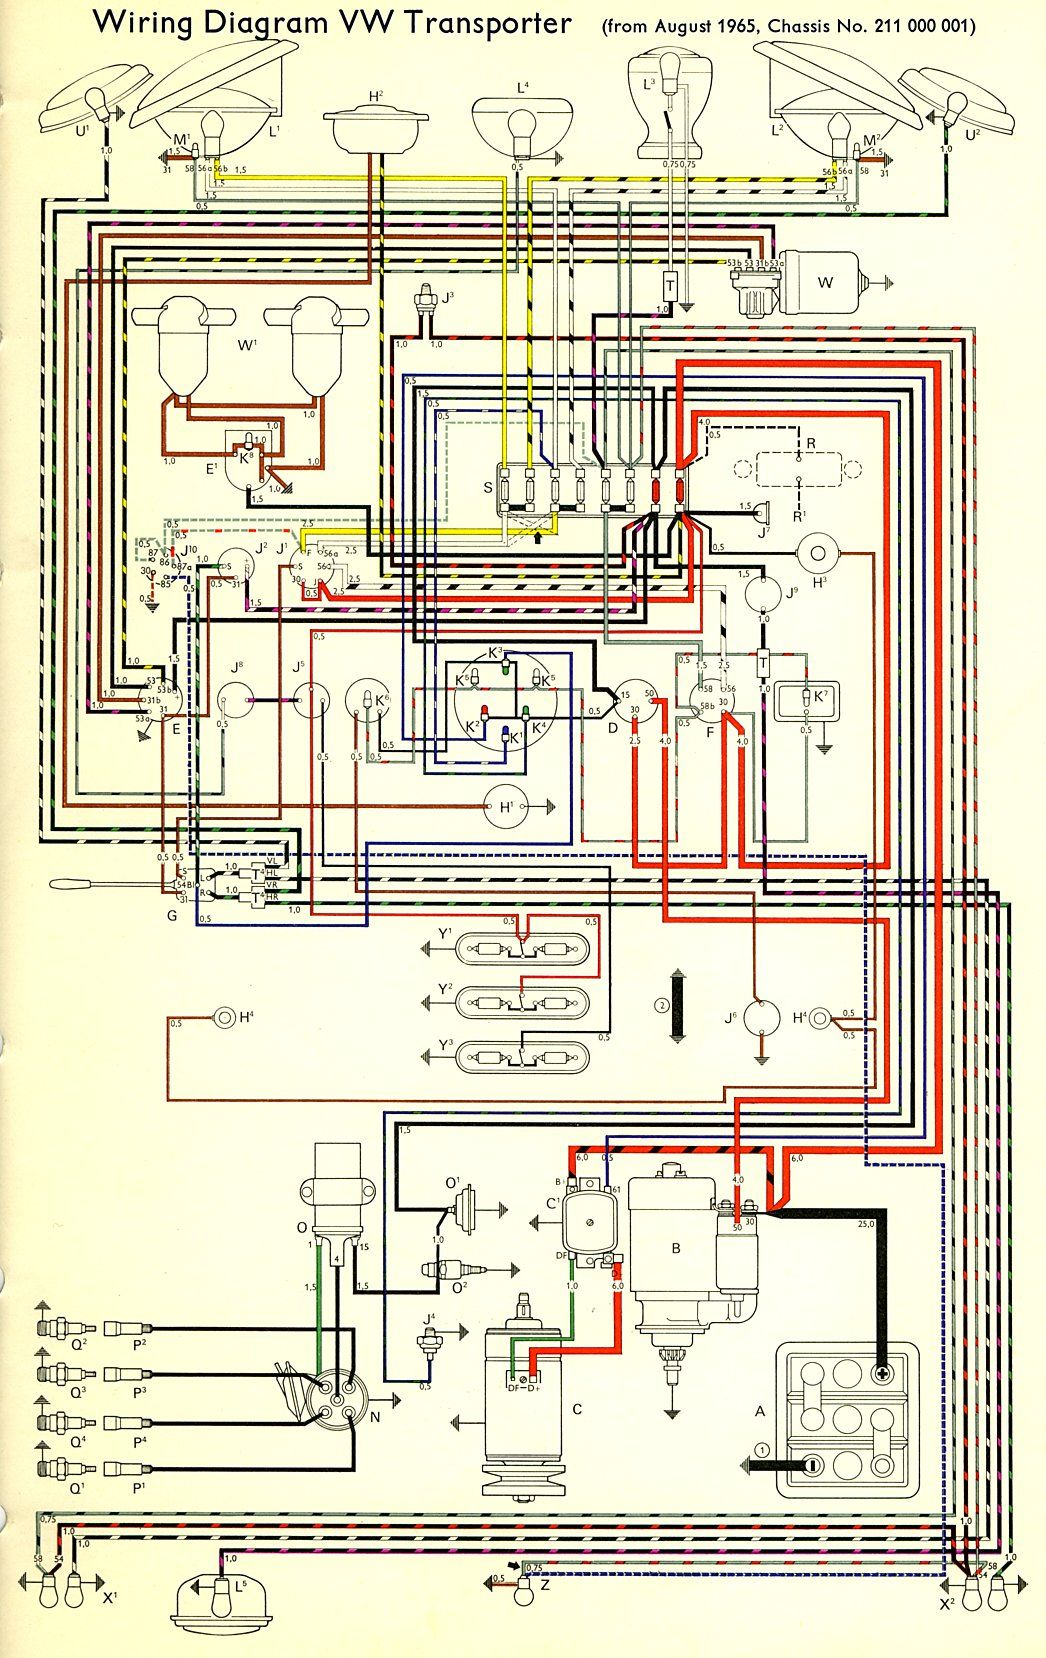 Wiring Diagram VW Transporter | The Samba | Bay Pride